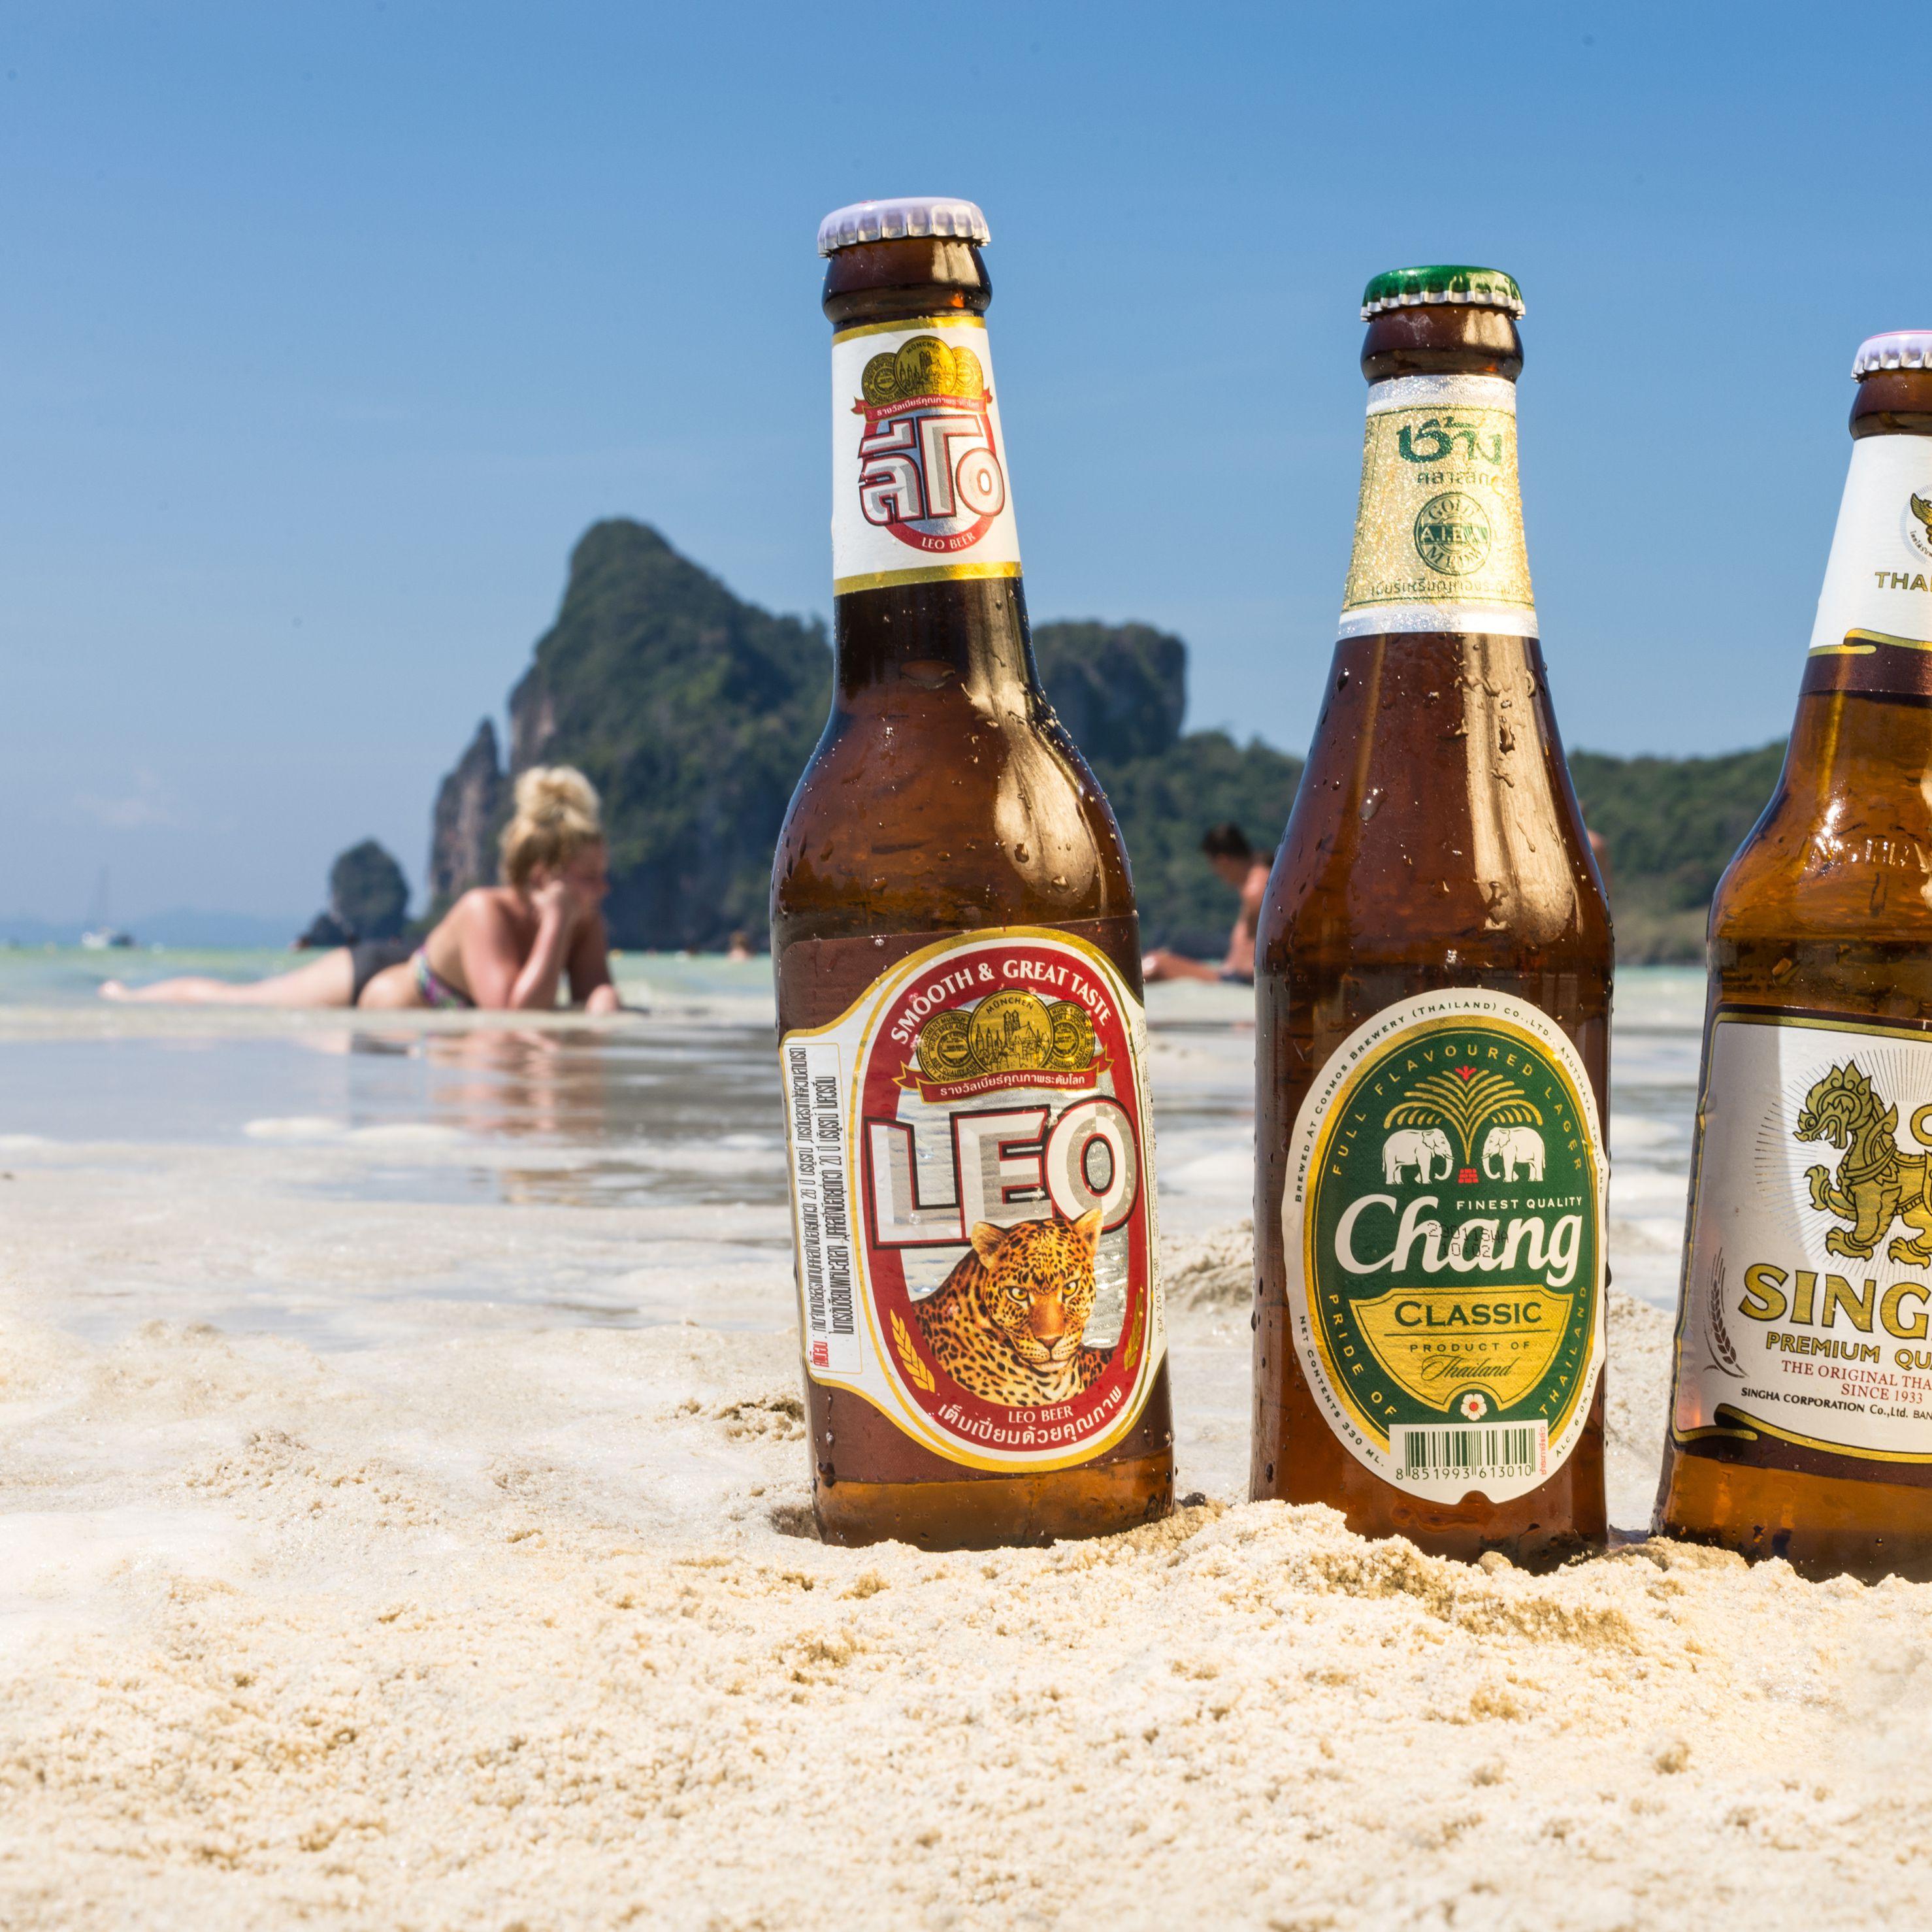 The Best Beer in Thailand